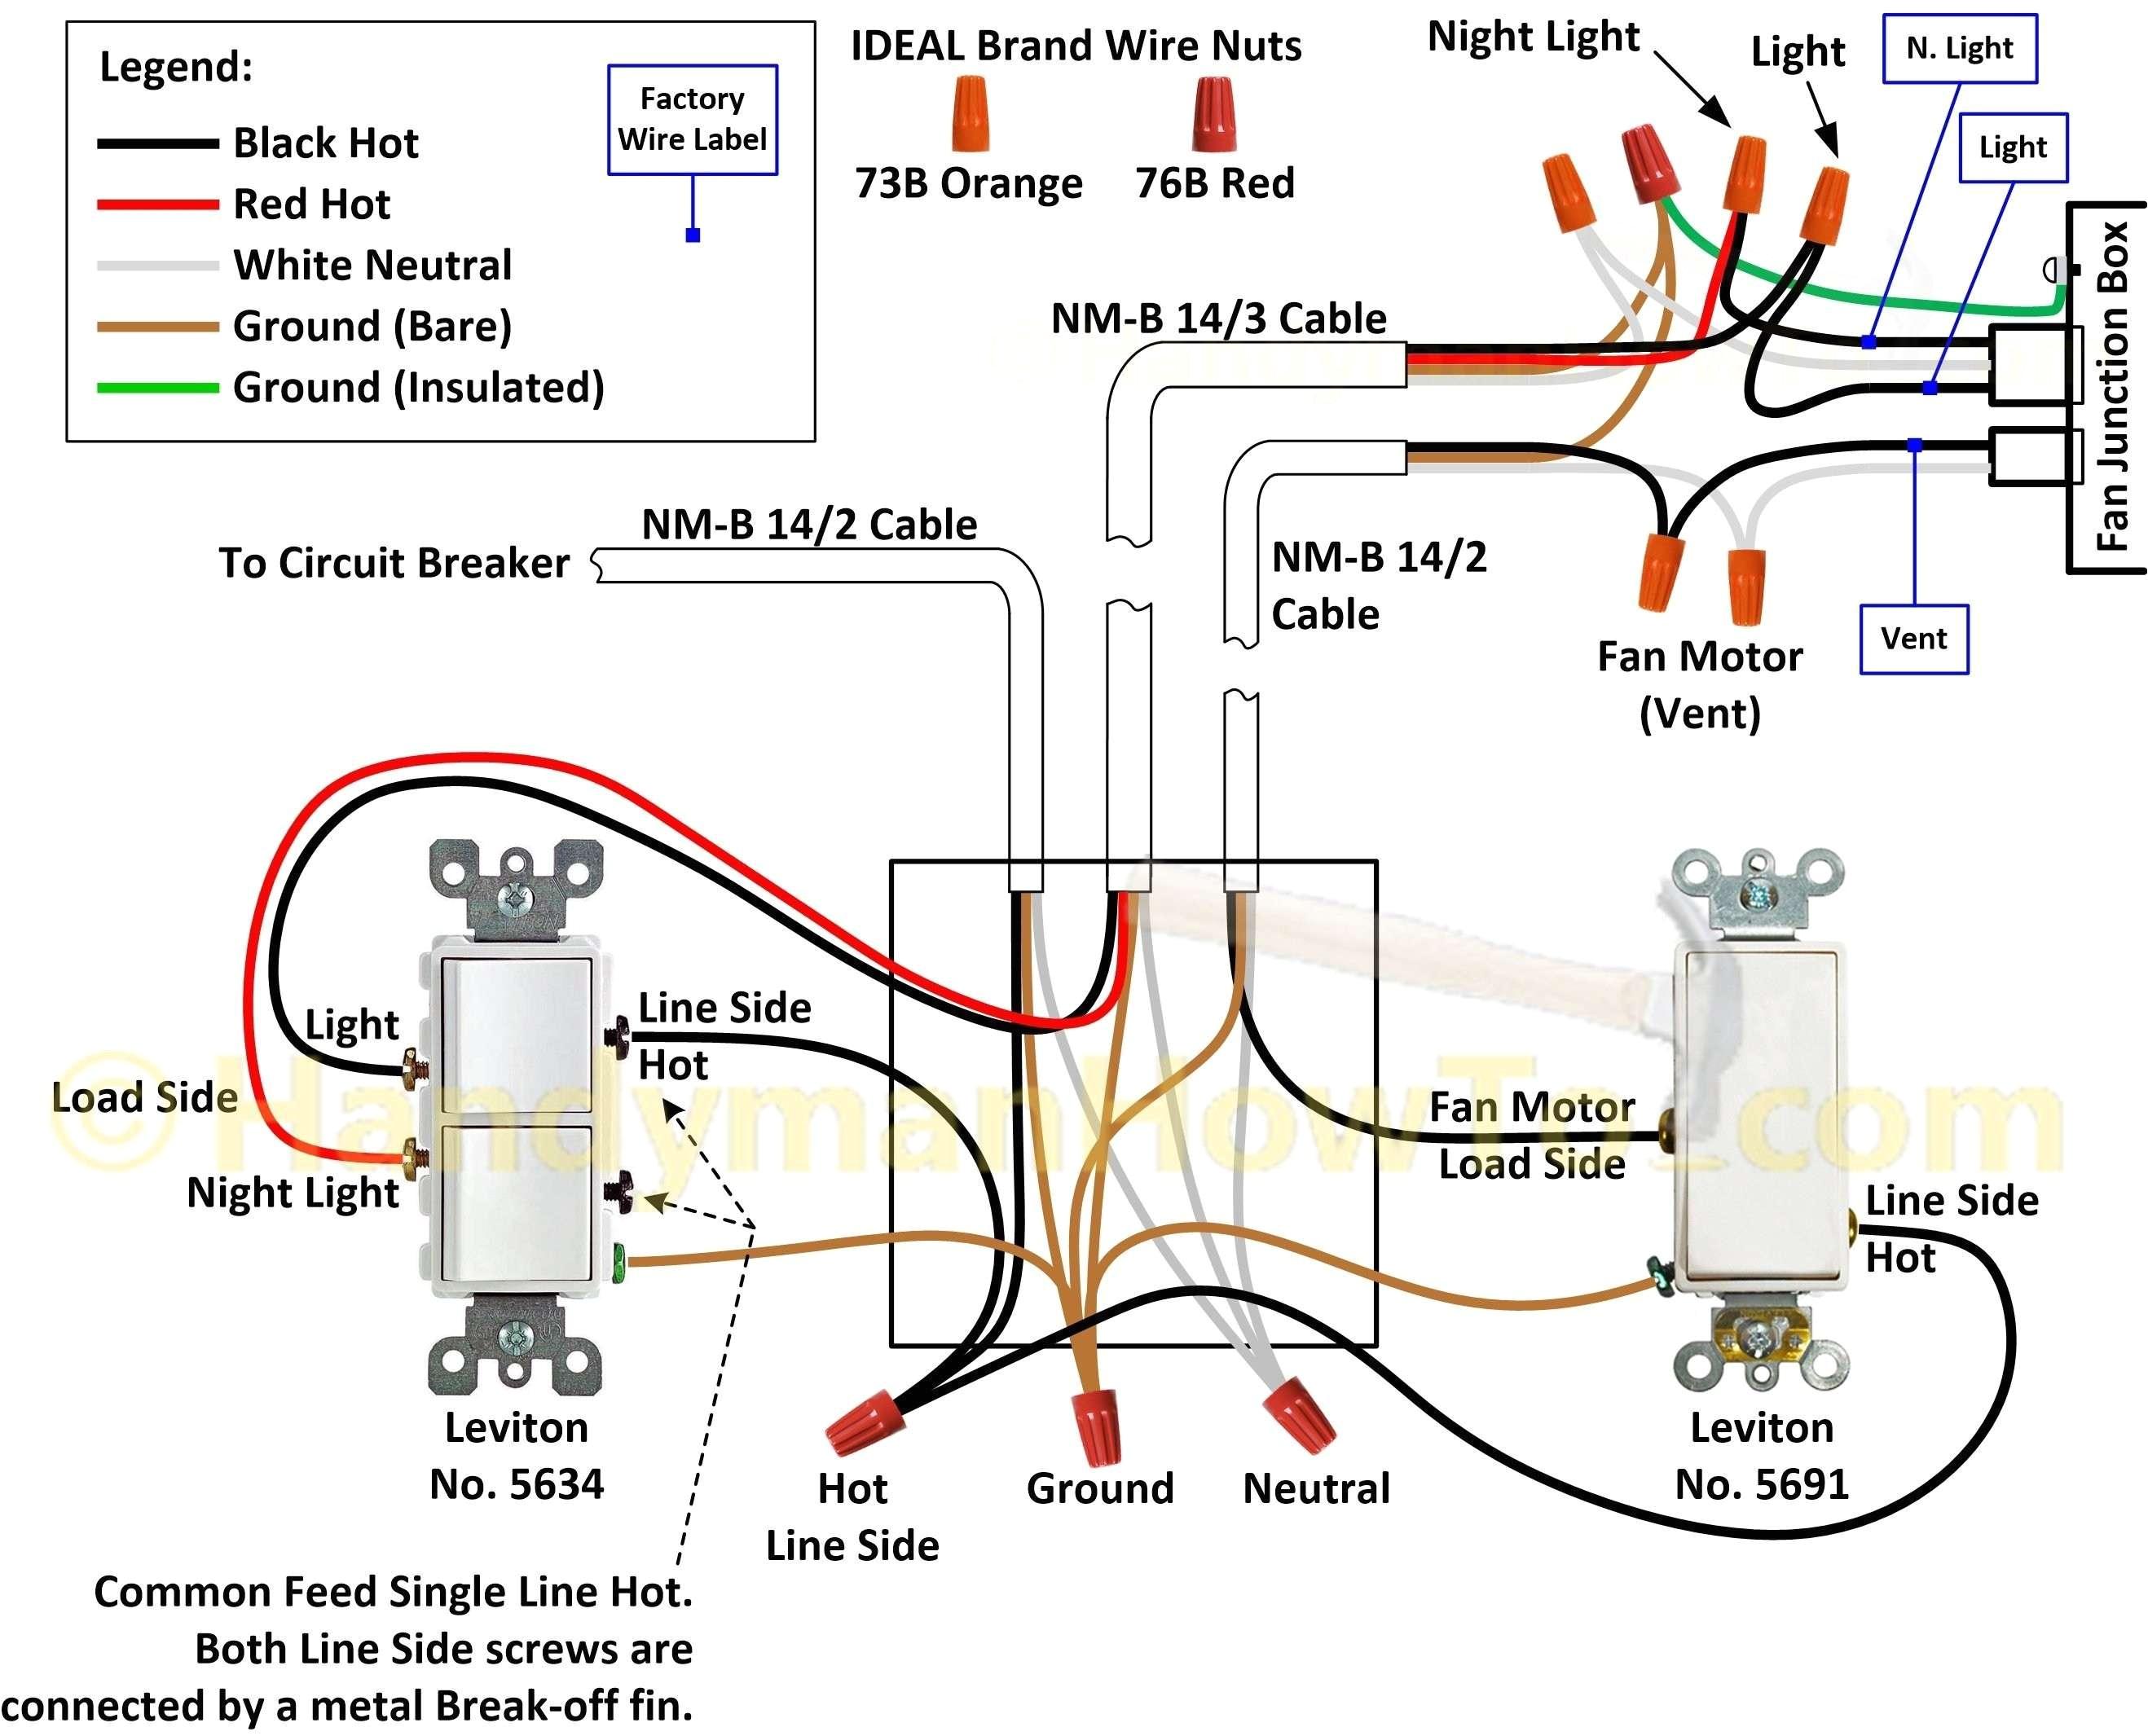 wiring in series diagram autocardesign. Black Bedroom Furniture Sets. Home Design Ideas